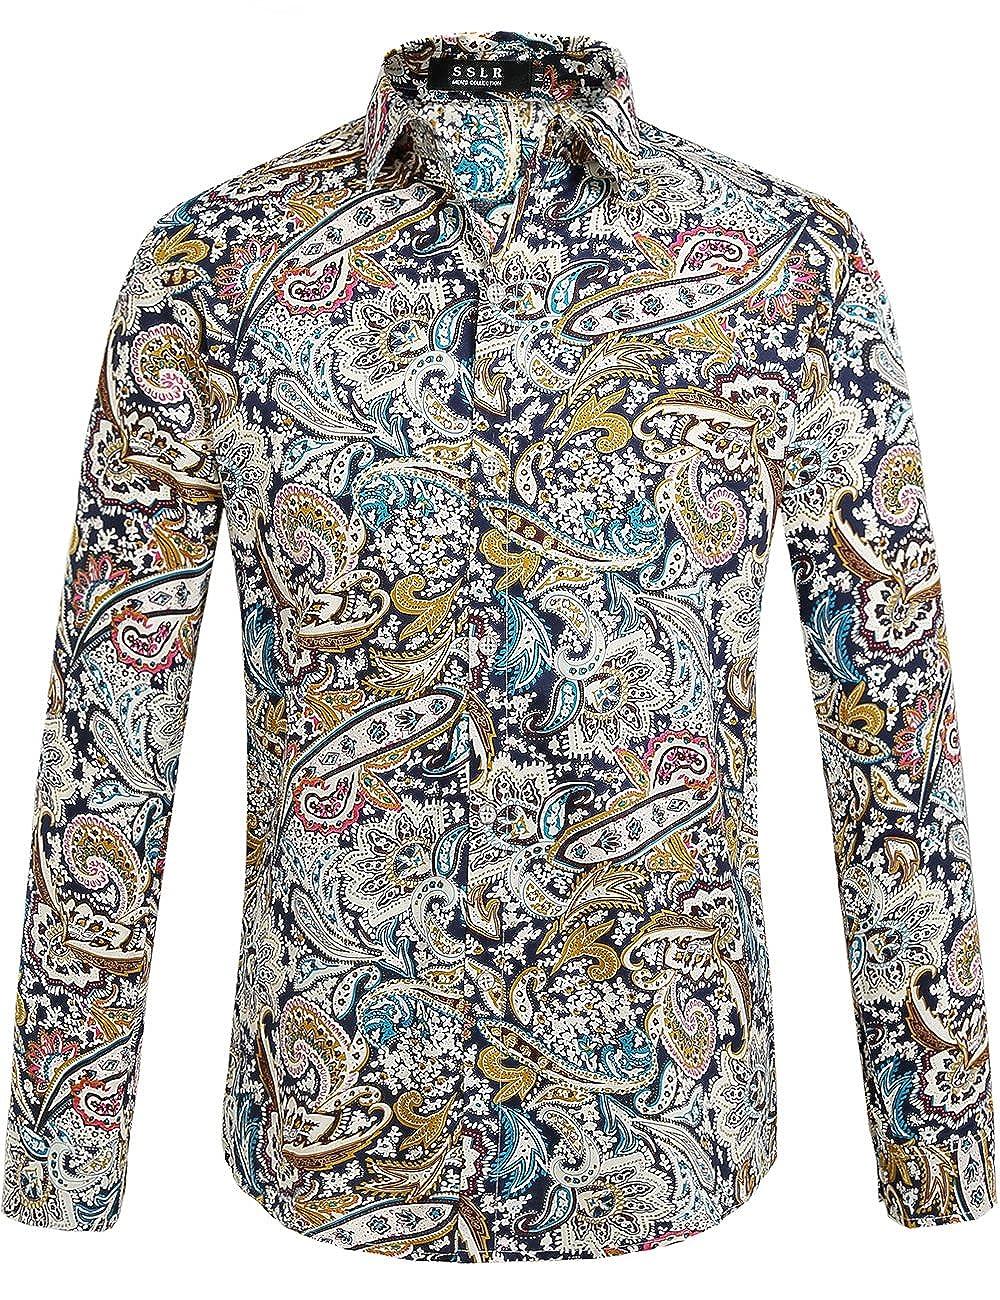 1960s – 70s Mens Shirts- Disco Shirts, Hippie Shirts SSLR Mens Paisley Cotton Casual Button Down Long Sleeve Shirt £26.42 AT vintagedancer.com